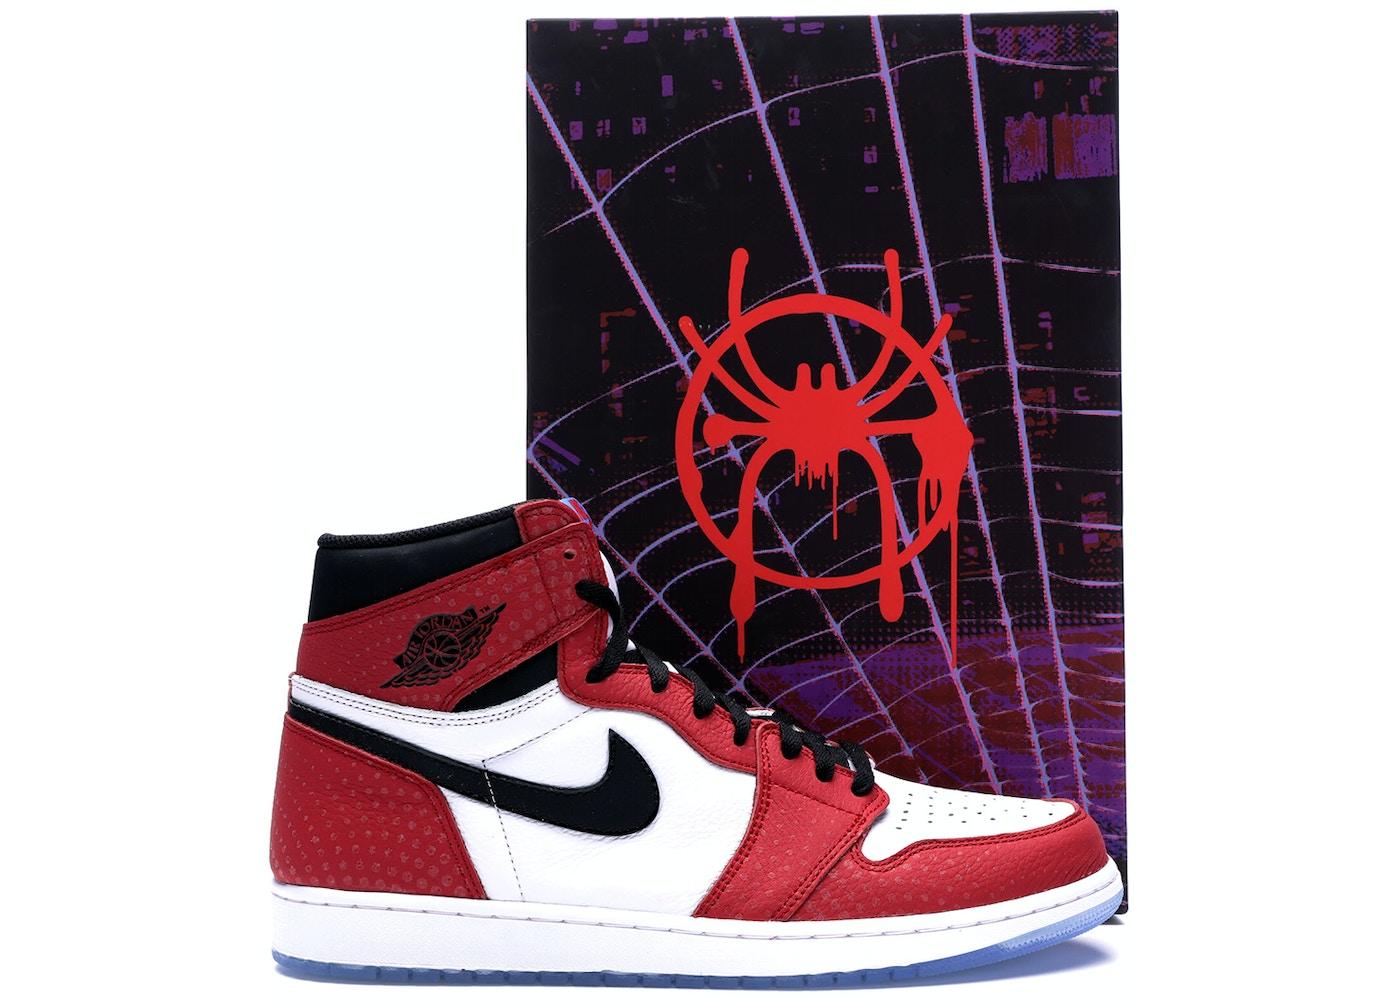 fc0807814b3 Air Jordan 1 Shoes - Last Sale